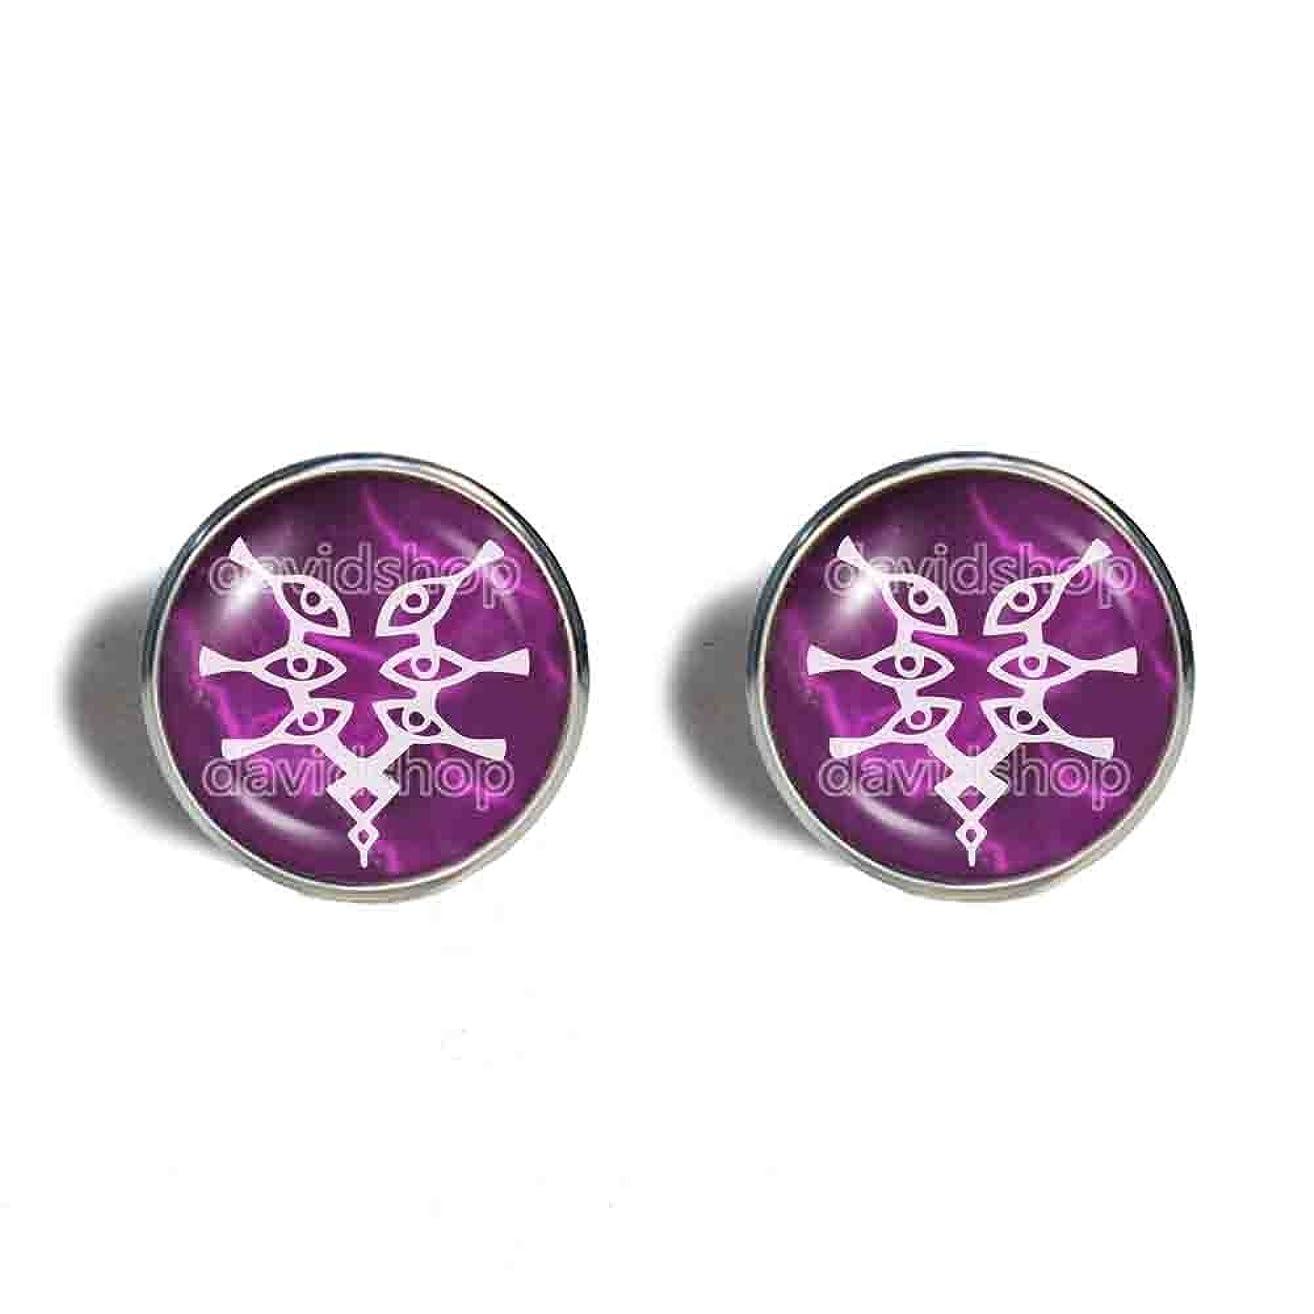 Handmade Fashion Jewelry Cute Gift Awakening Symbol Fire Emblem Grima Cufflinks Cuff links Cosplay White